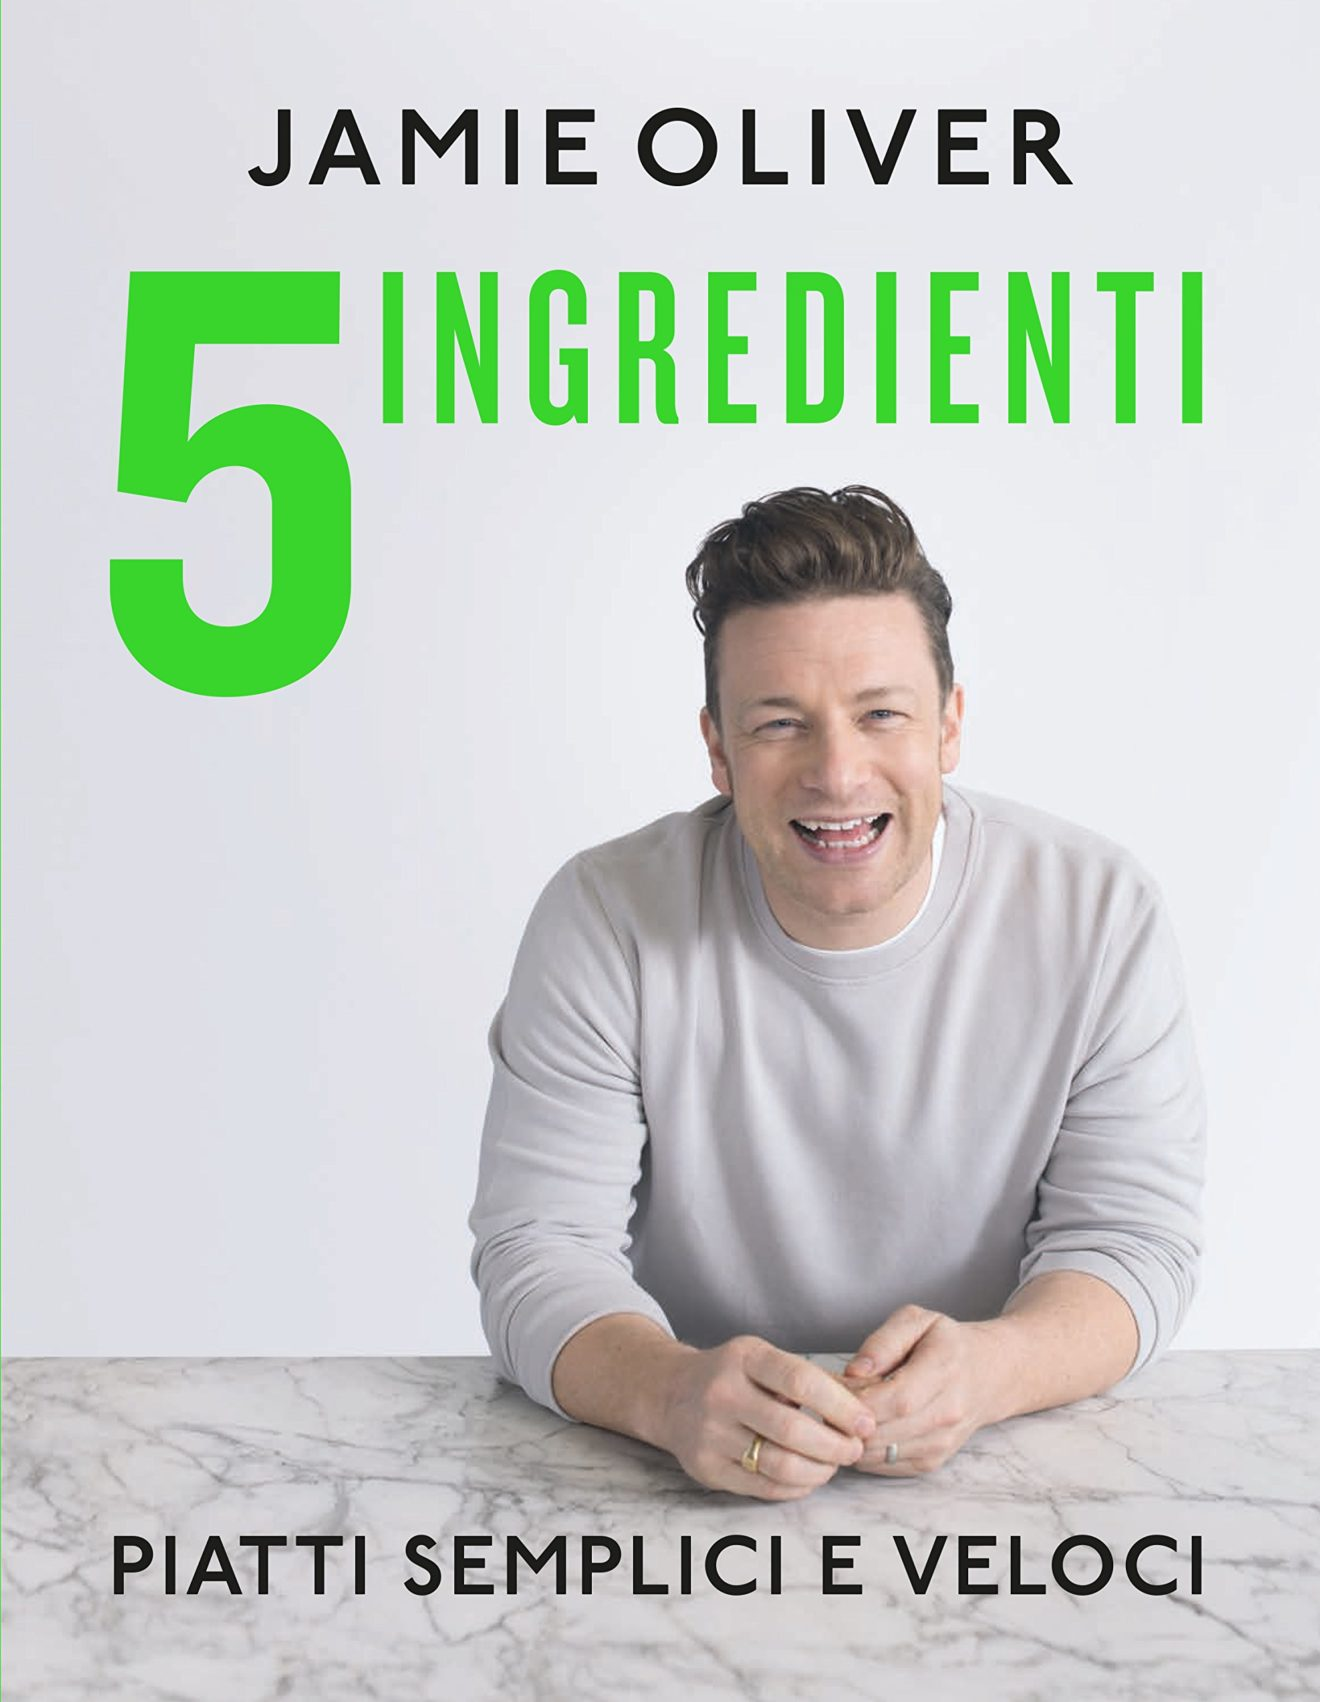 ricetta da Jamie Oliver 5 ingredienti